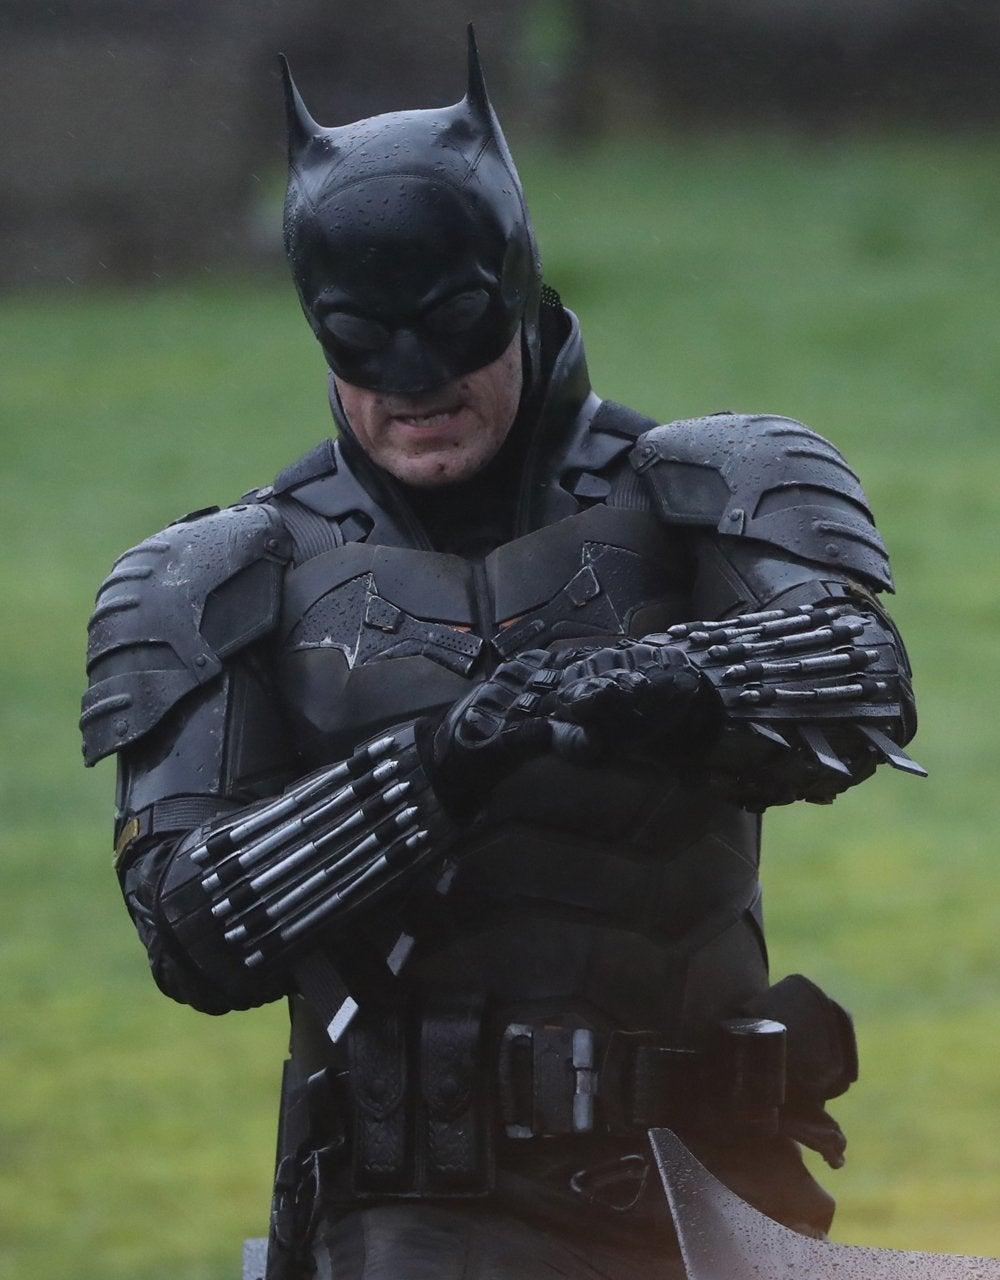 https://media.comicbook.com/2020/02/the-batman-set-photos-batsuit-batcycle-full-look-4-1207992.jpeg?auto=webp&width=1000&height=1280&crop=1000:1280,smart